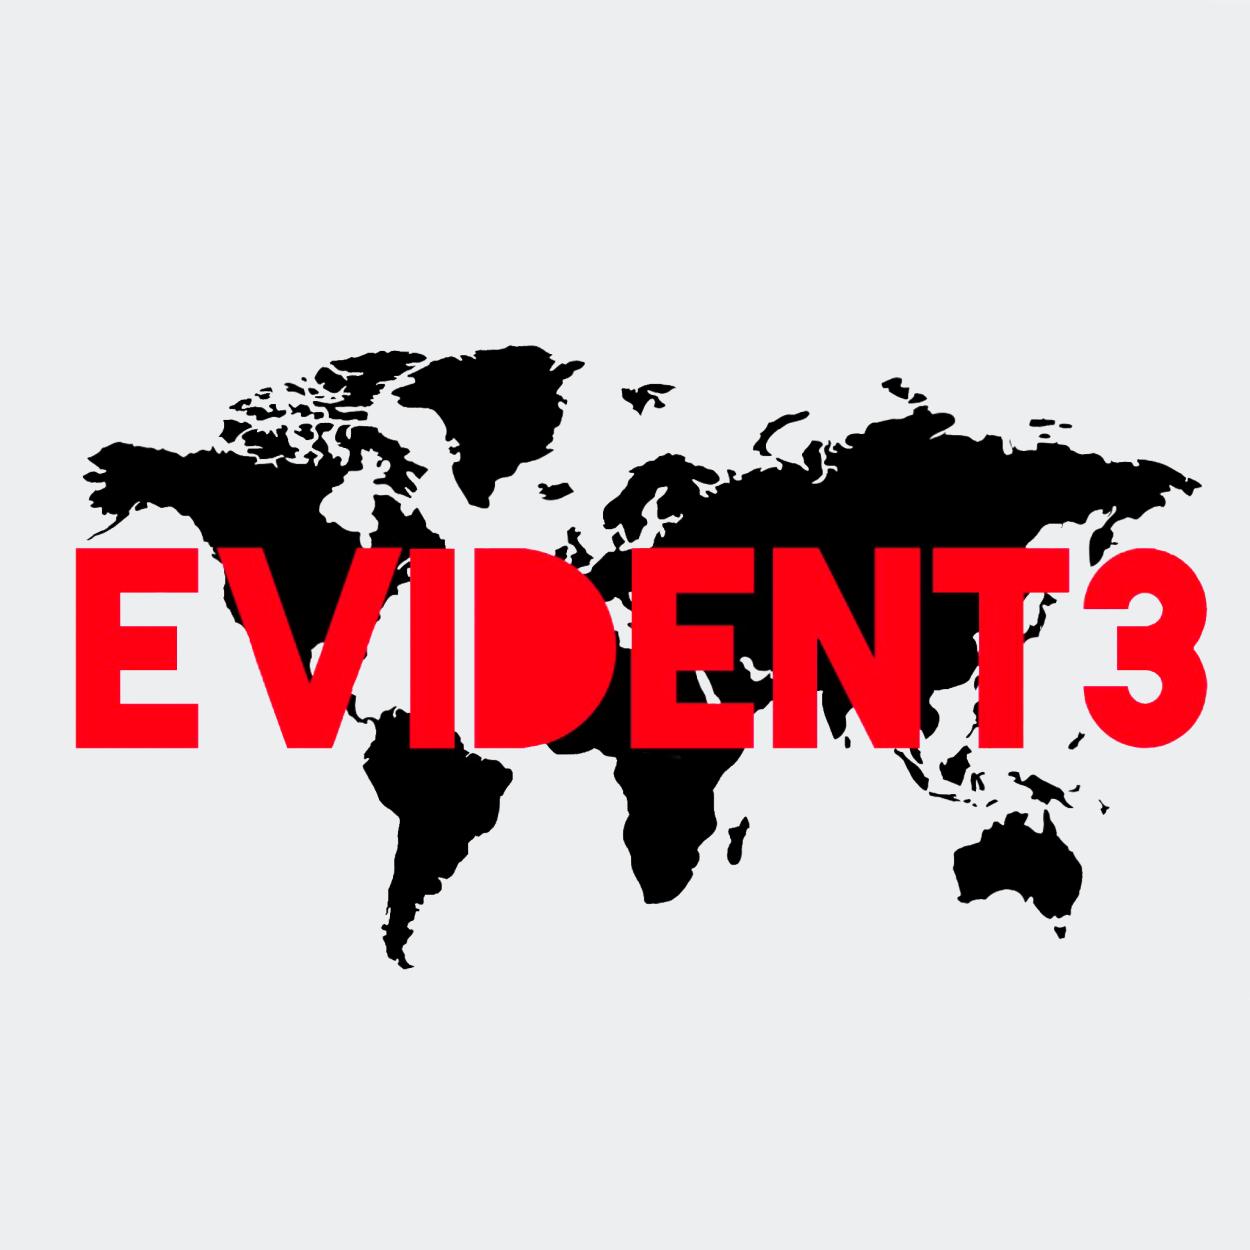 EVIDENTHREE ロゴ